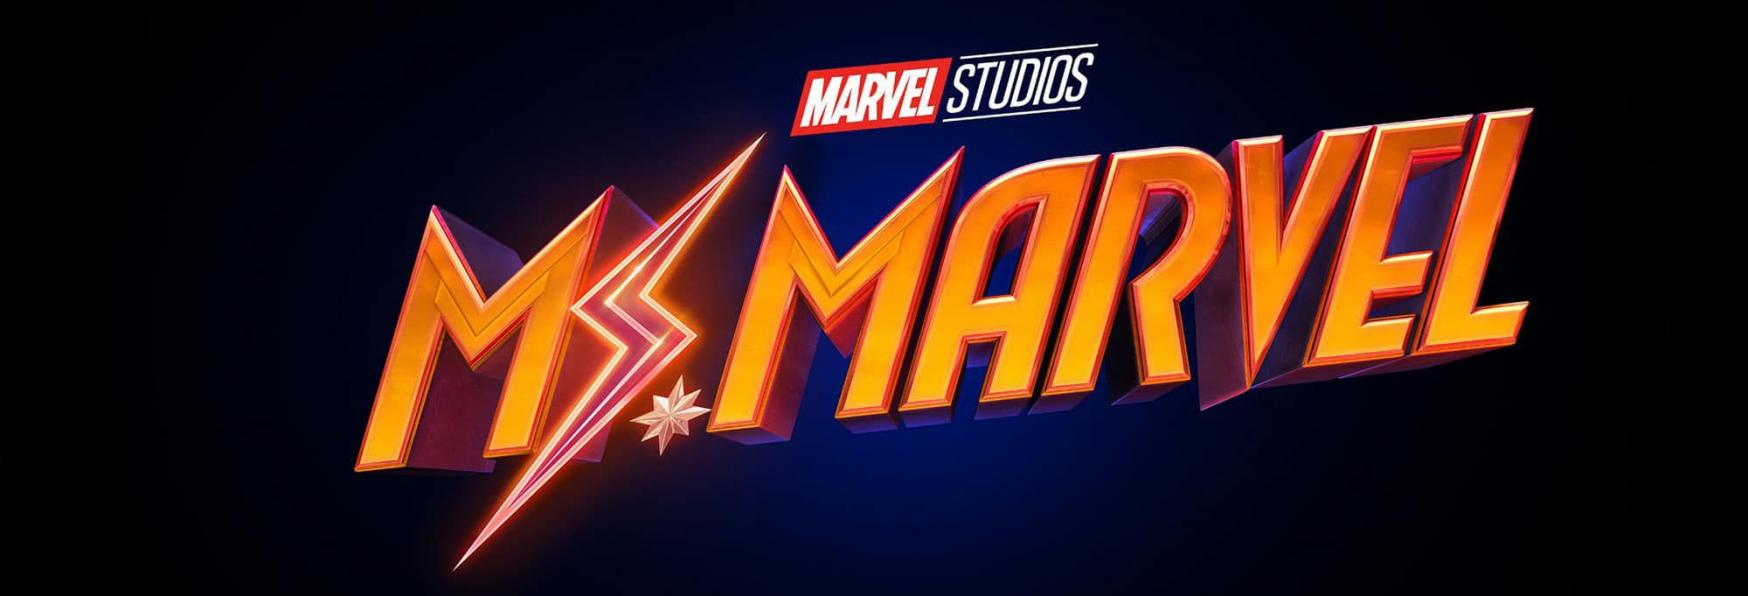 Ms. Marvel: Posticipata al 2022 l'Uscita della Serie TV targata Disney+?